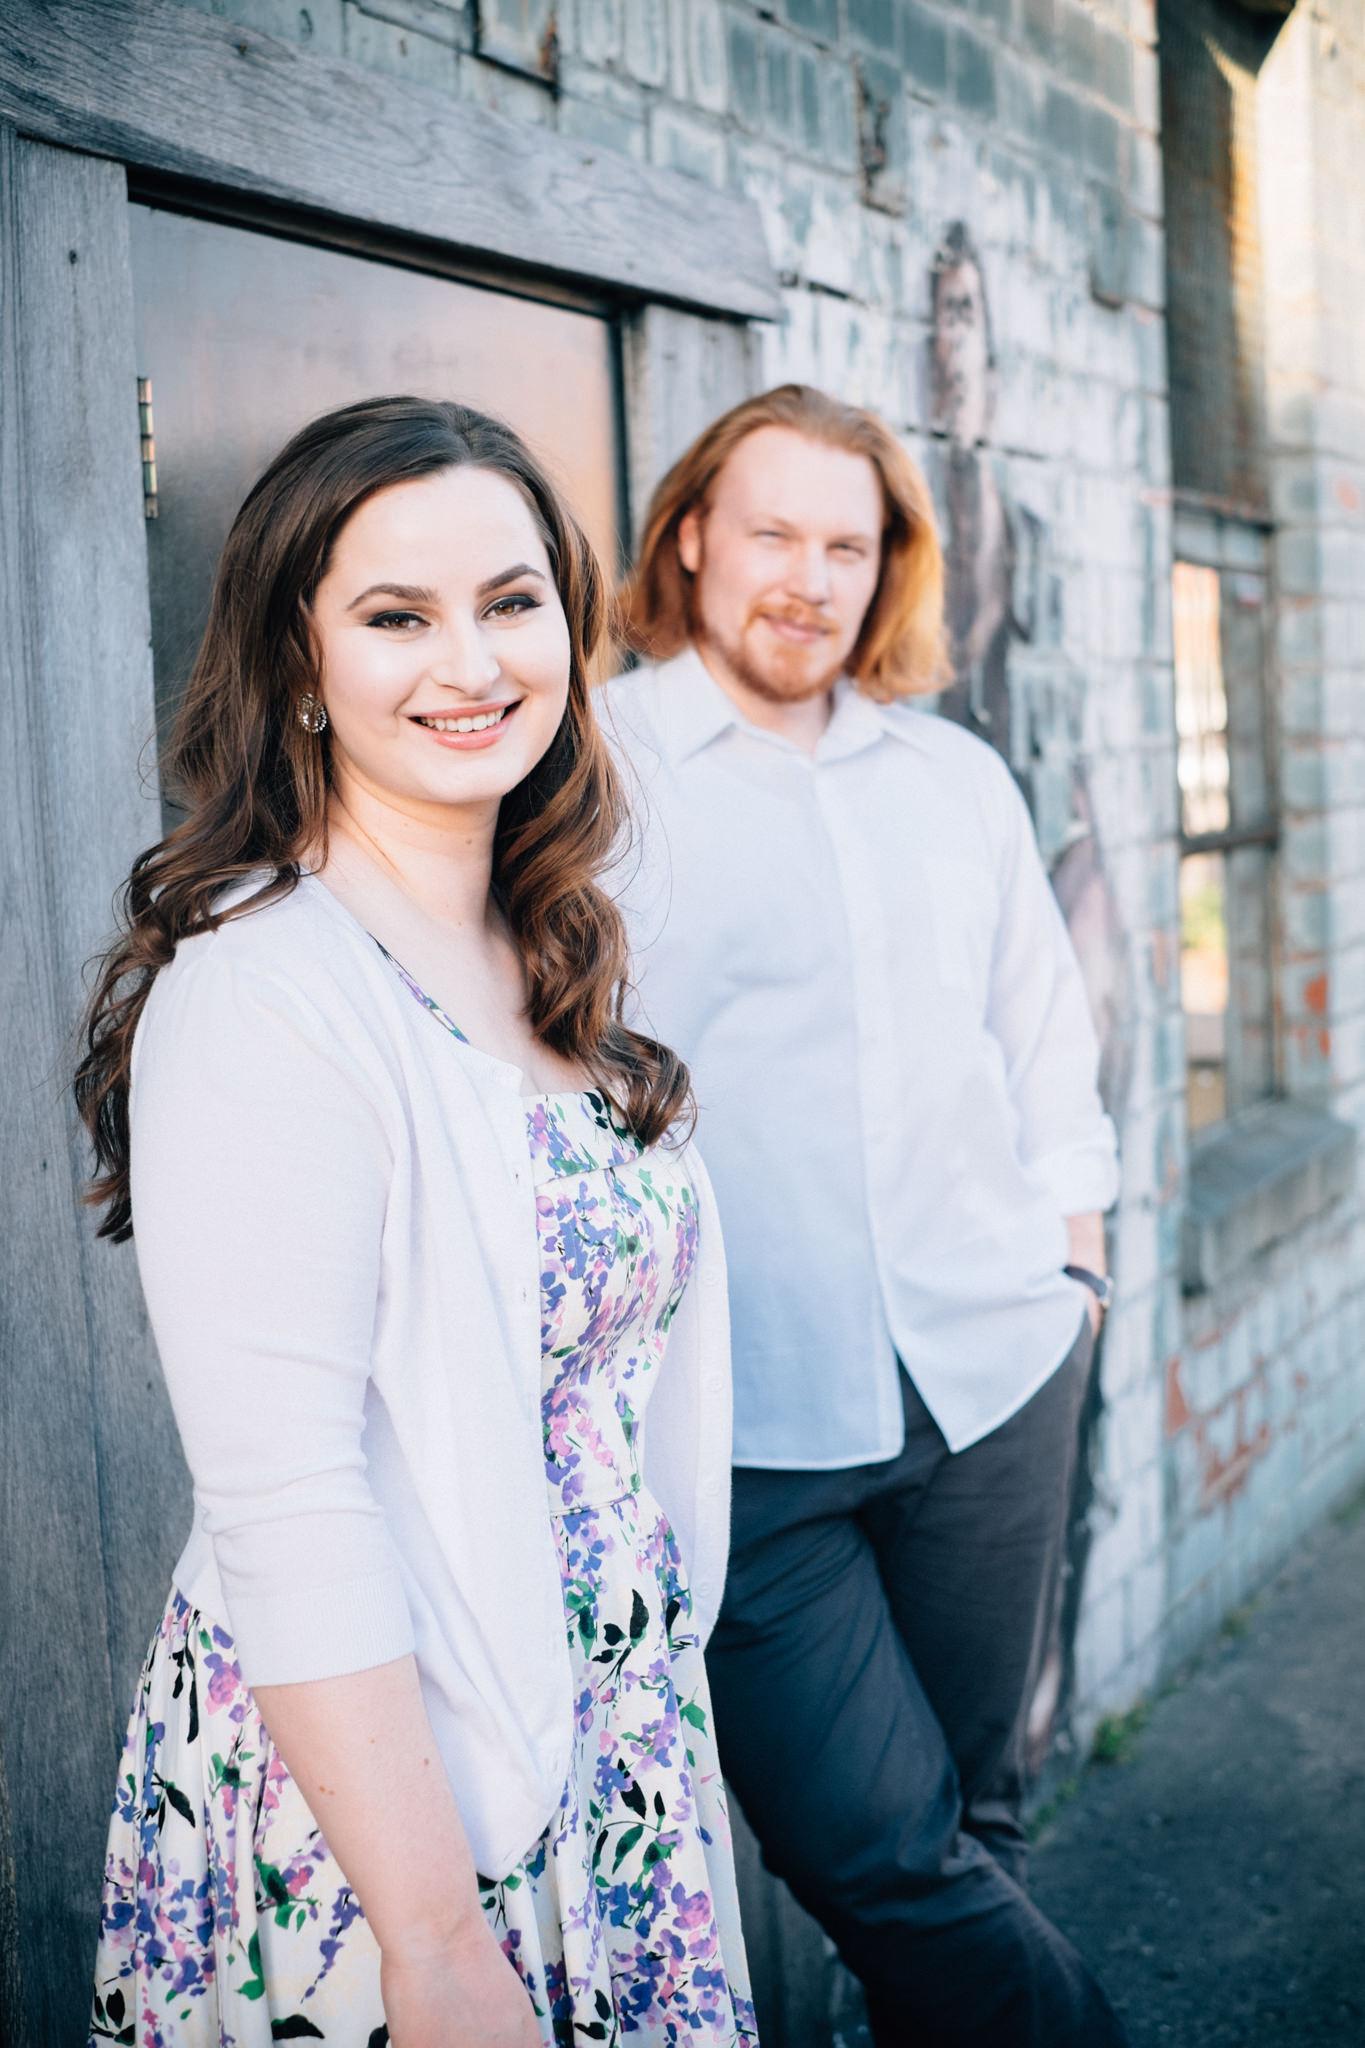 Anya&Matt_Engagement_Blog_009.jpg